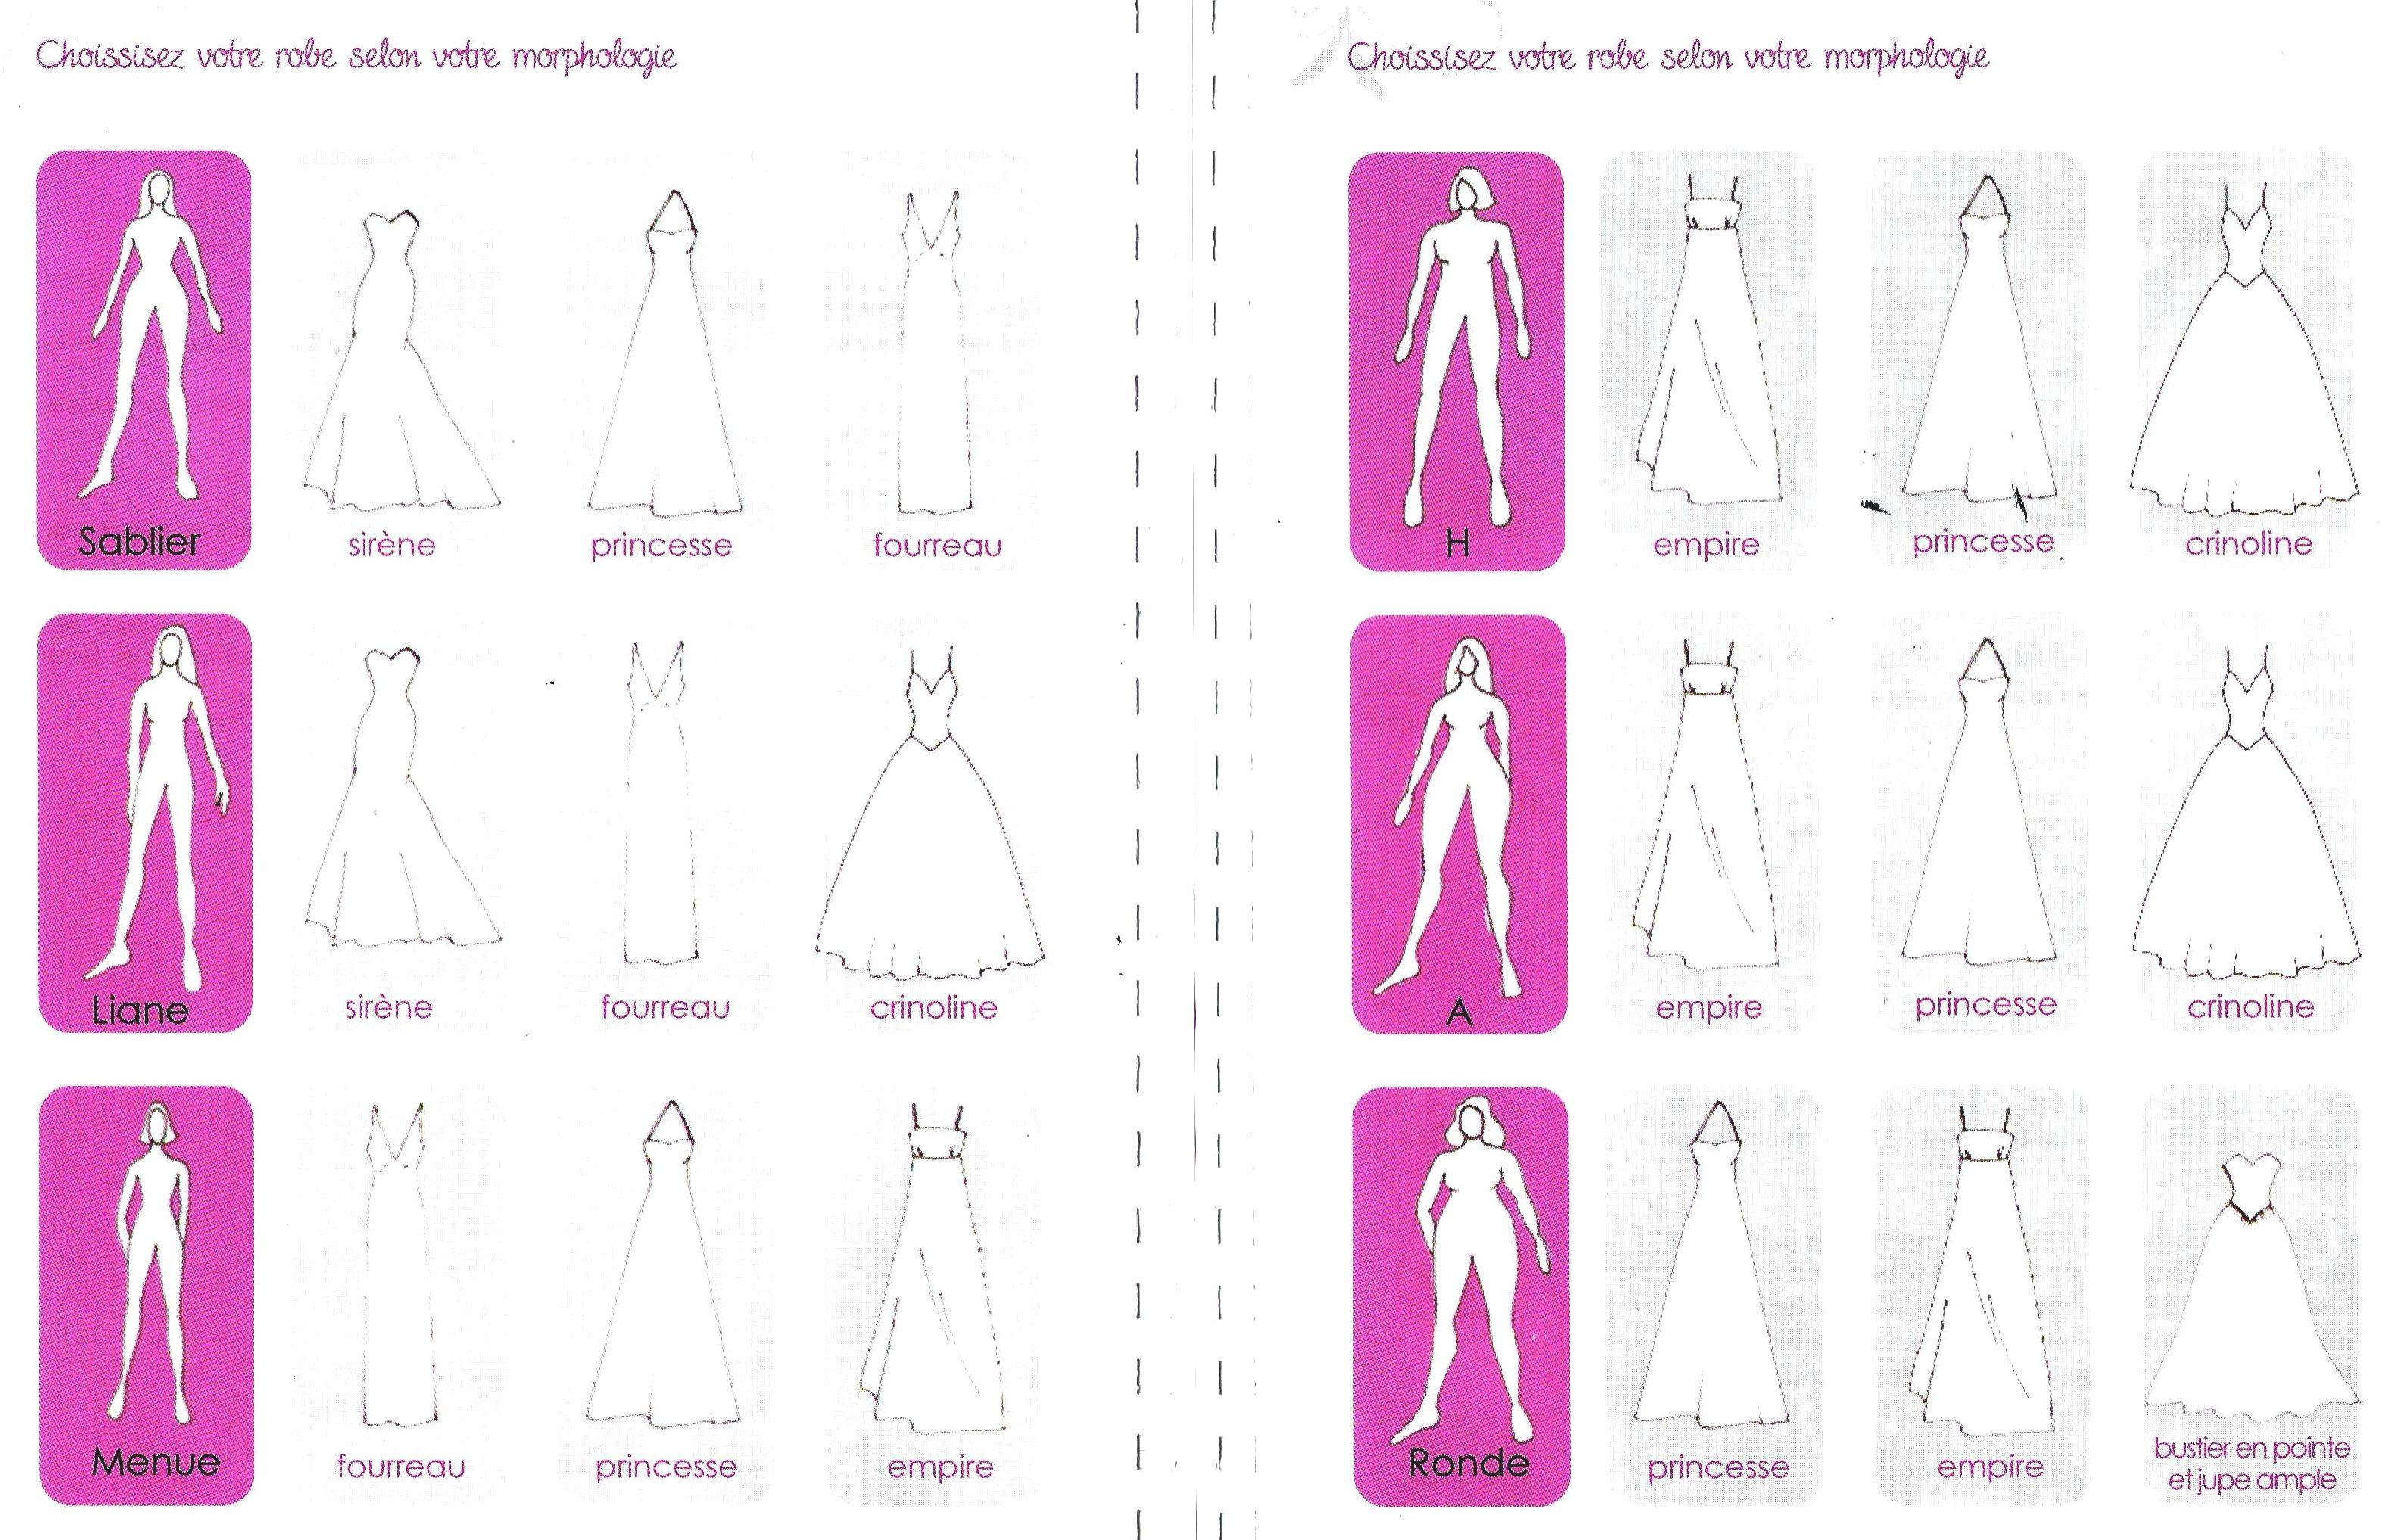 Morphologie en 2020 | Robes de mariée morphologie, Morphologie et Morphologie x